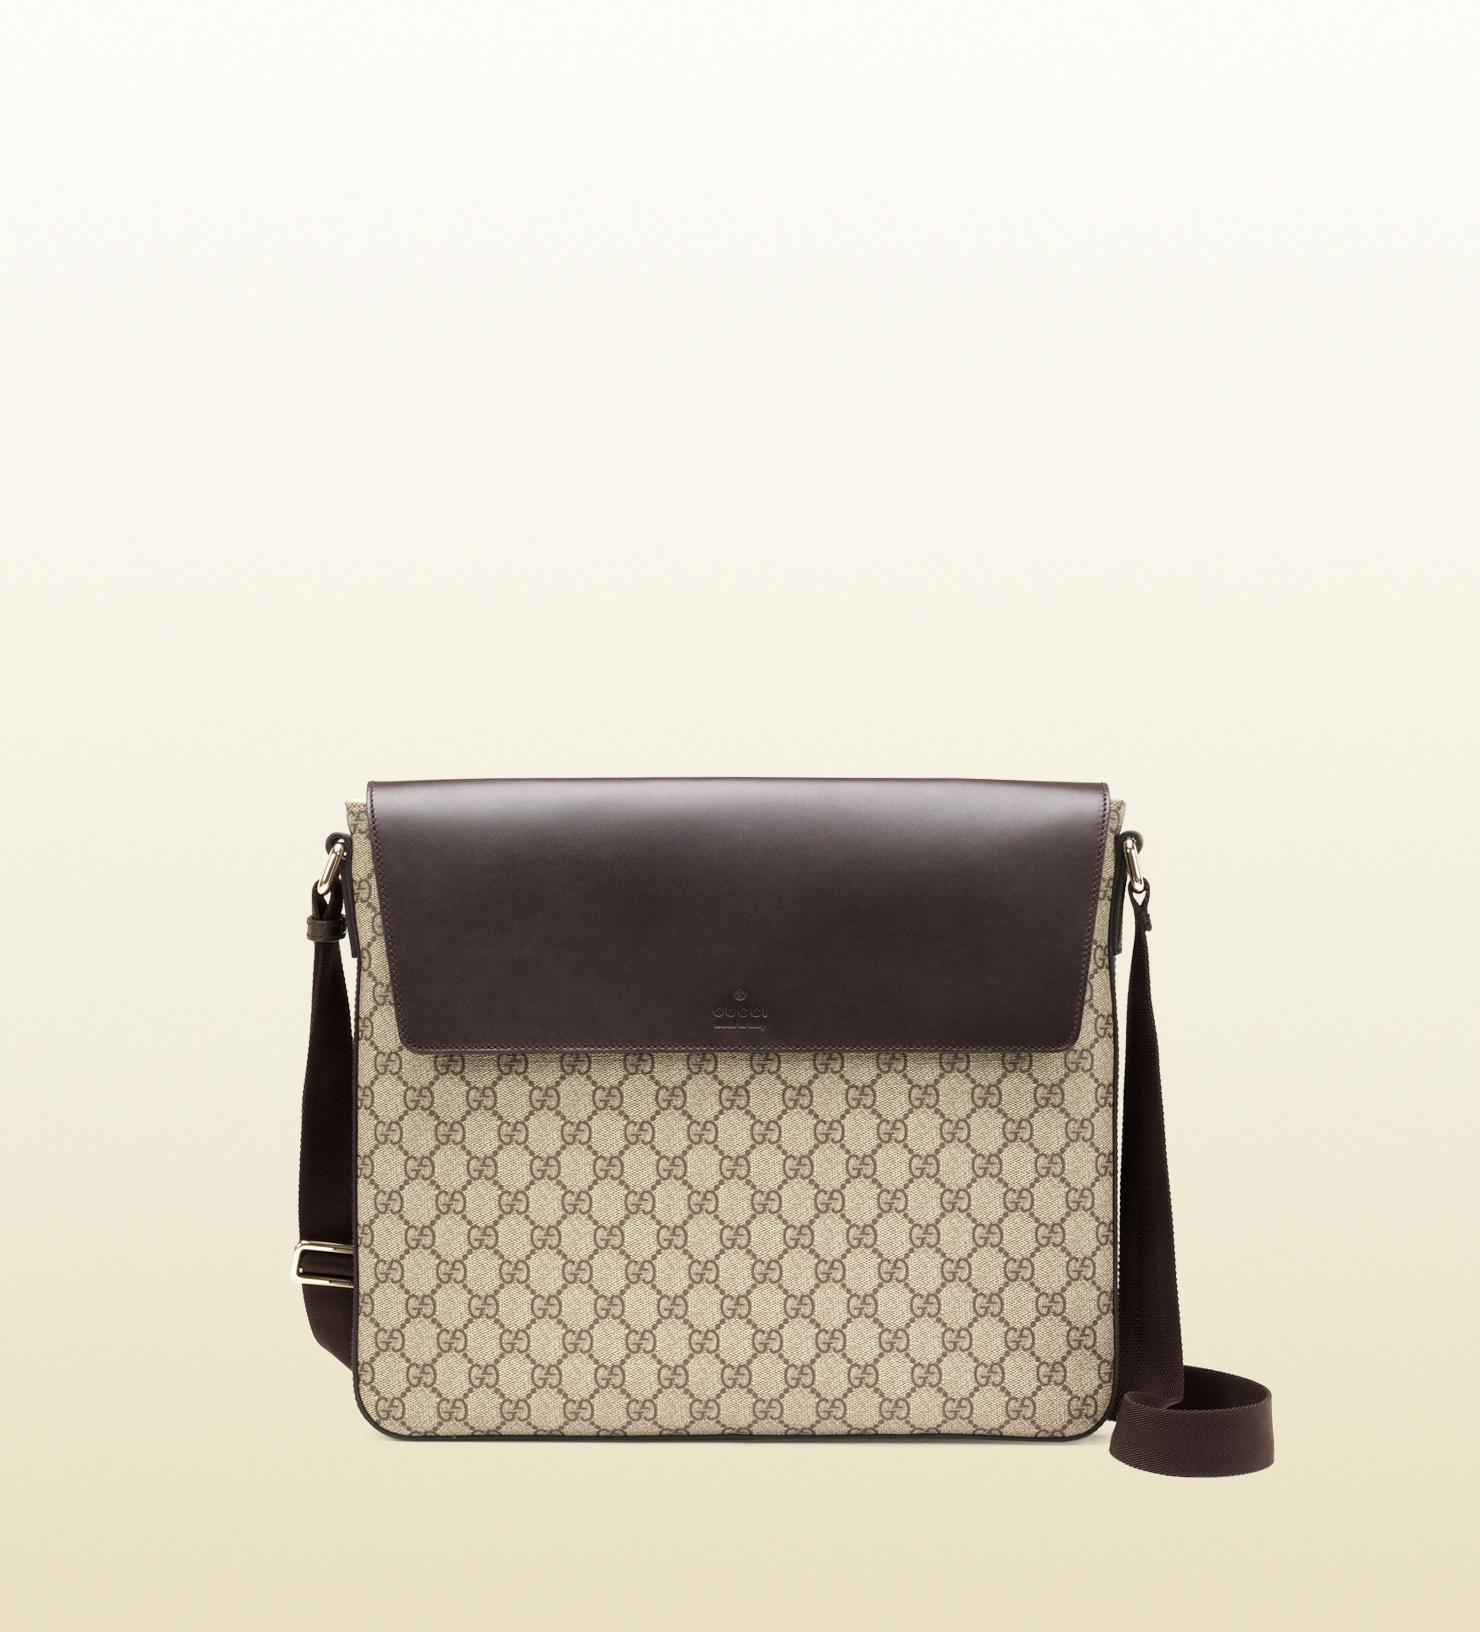 93324a12c88c Gucci Gg Supreme Canvas Messenger Bag in Black for Men - Lyst